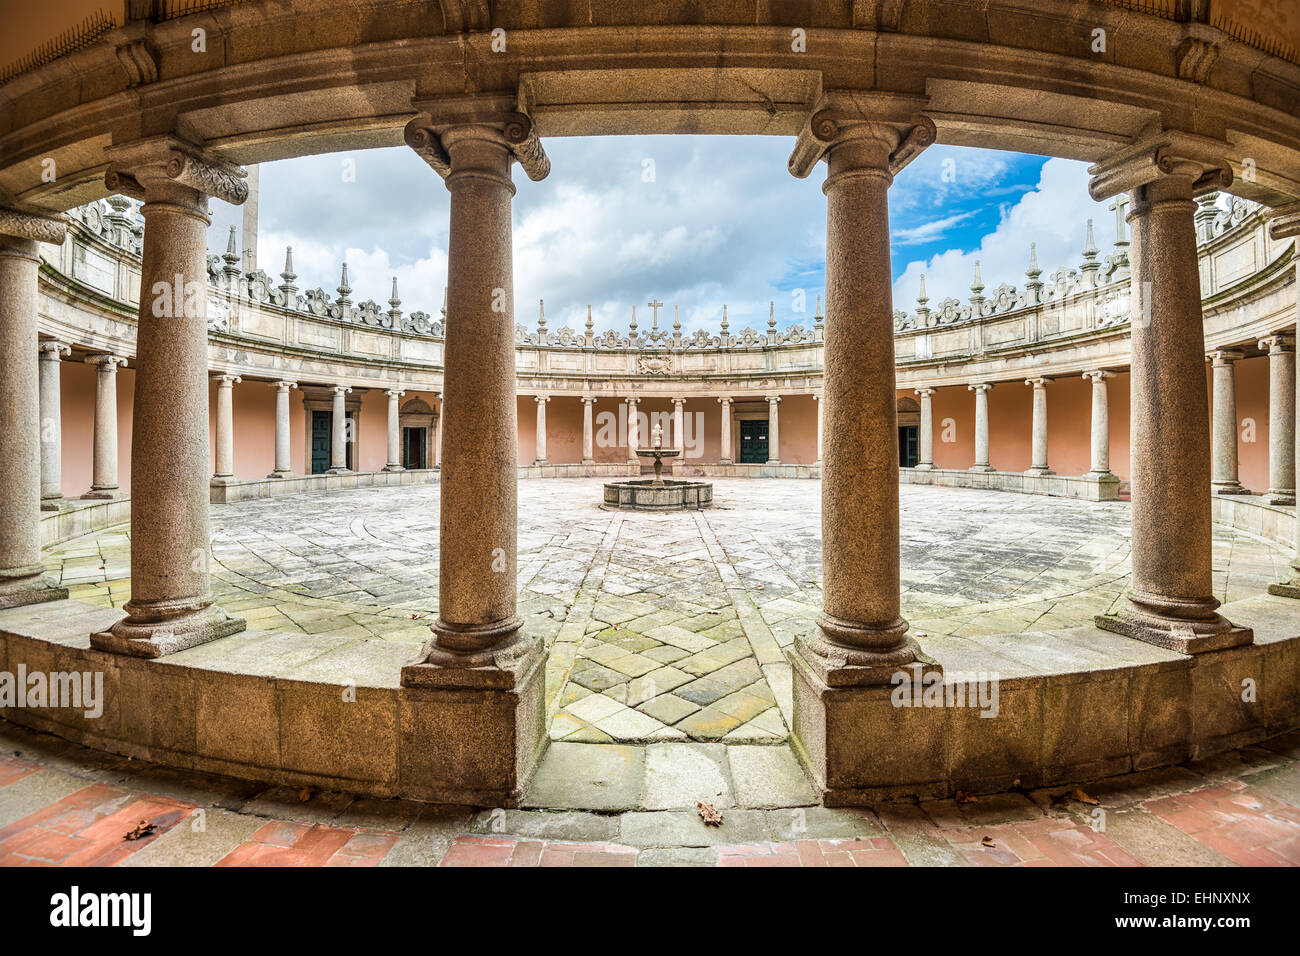 Porto, Portugal at Serra do Pilar Monastery courtyard. - Stock Image